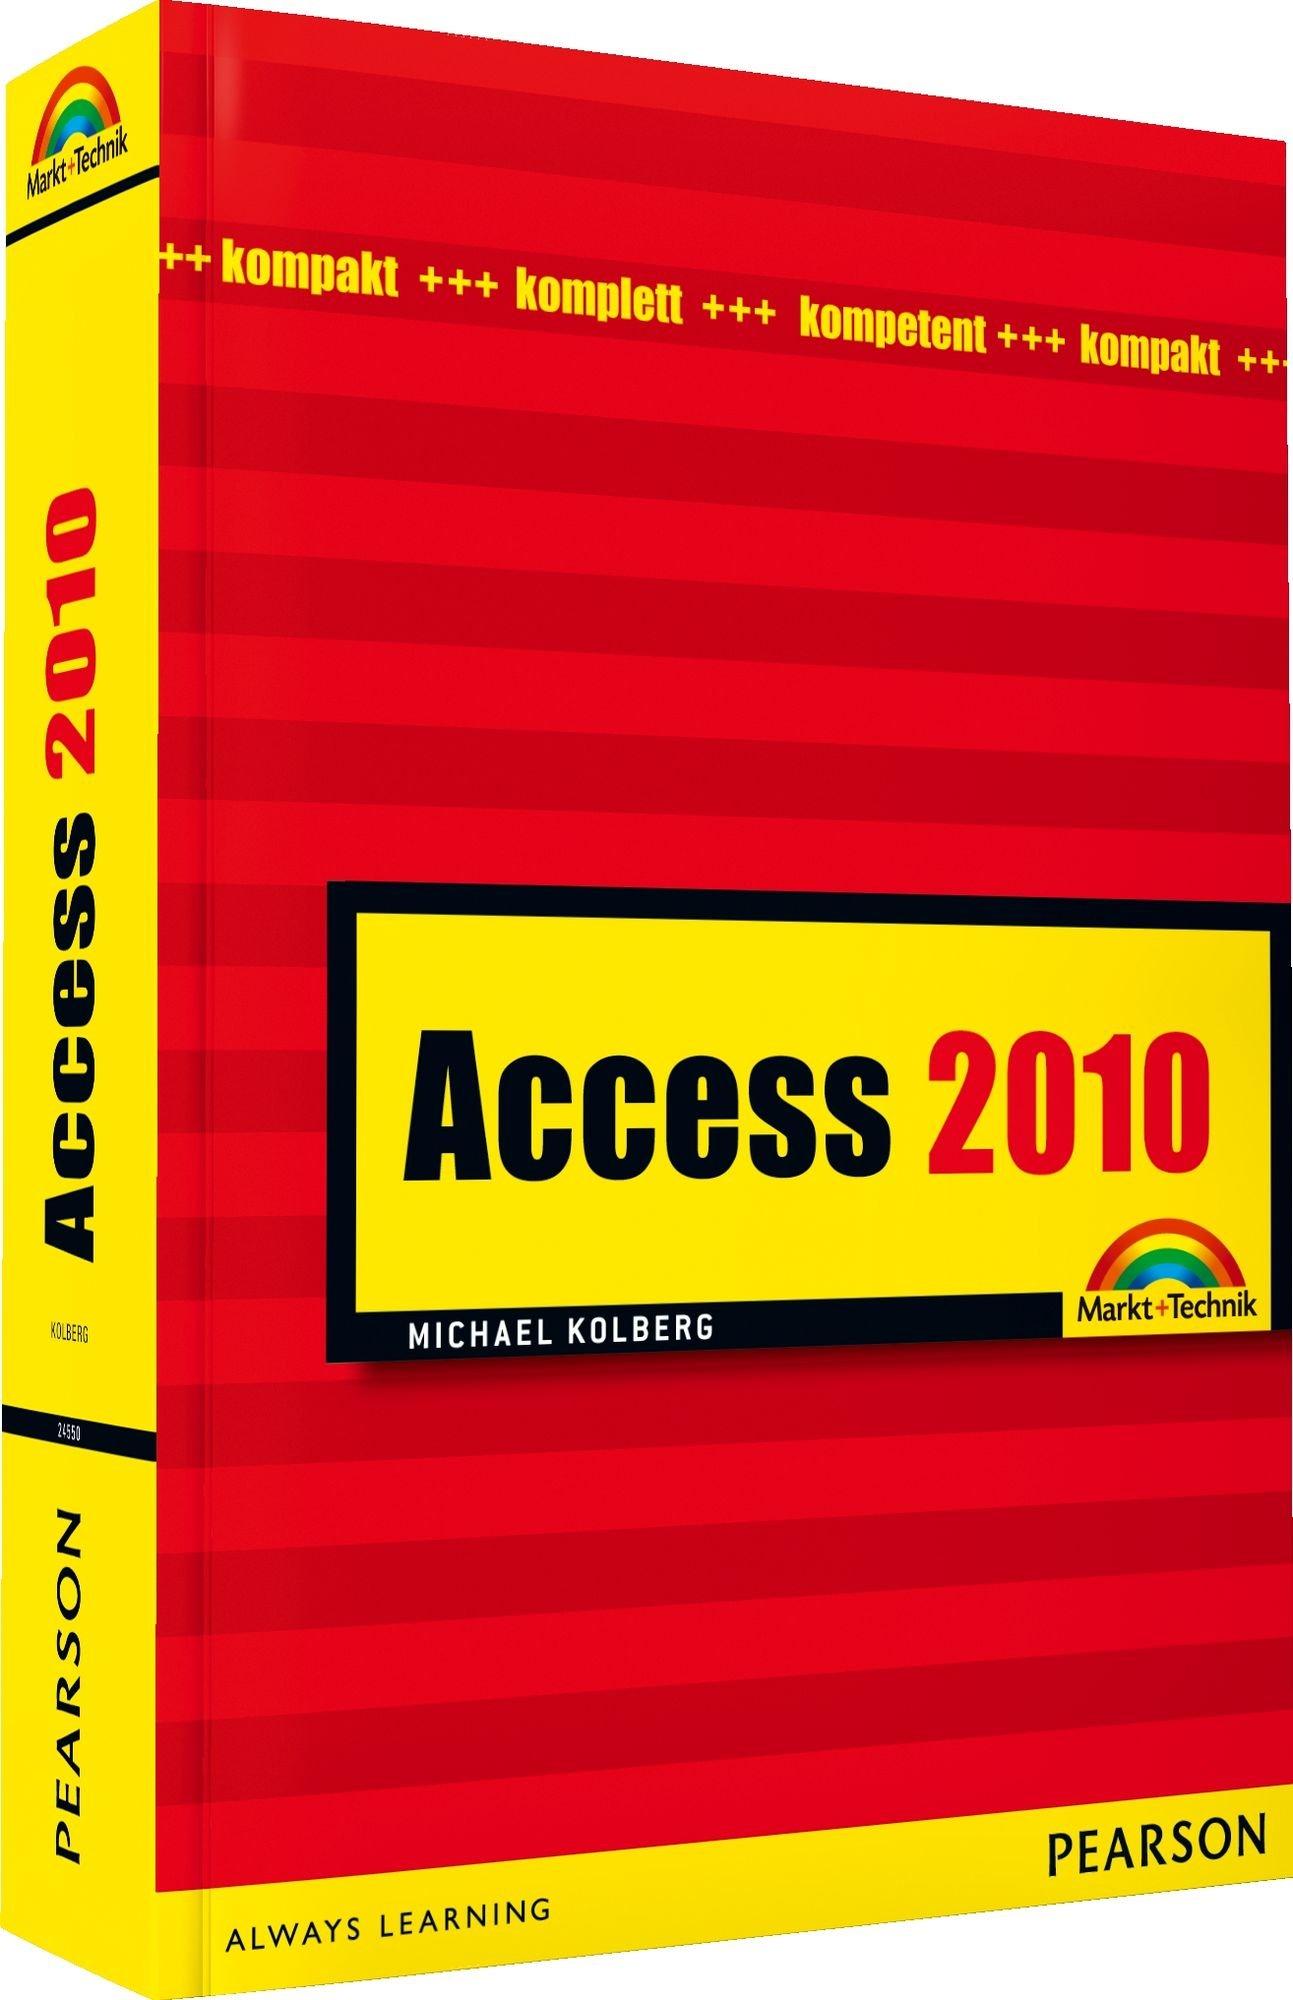 Access 2010: kompakt, komplett, kompetent (Magnum) Taschenbuch – 1. August 2010 Michael Kolberg Markt+Technik Verlag 3827245508 Anwendungs-Software